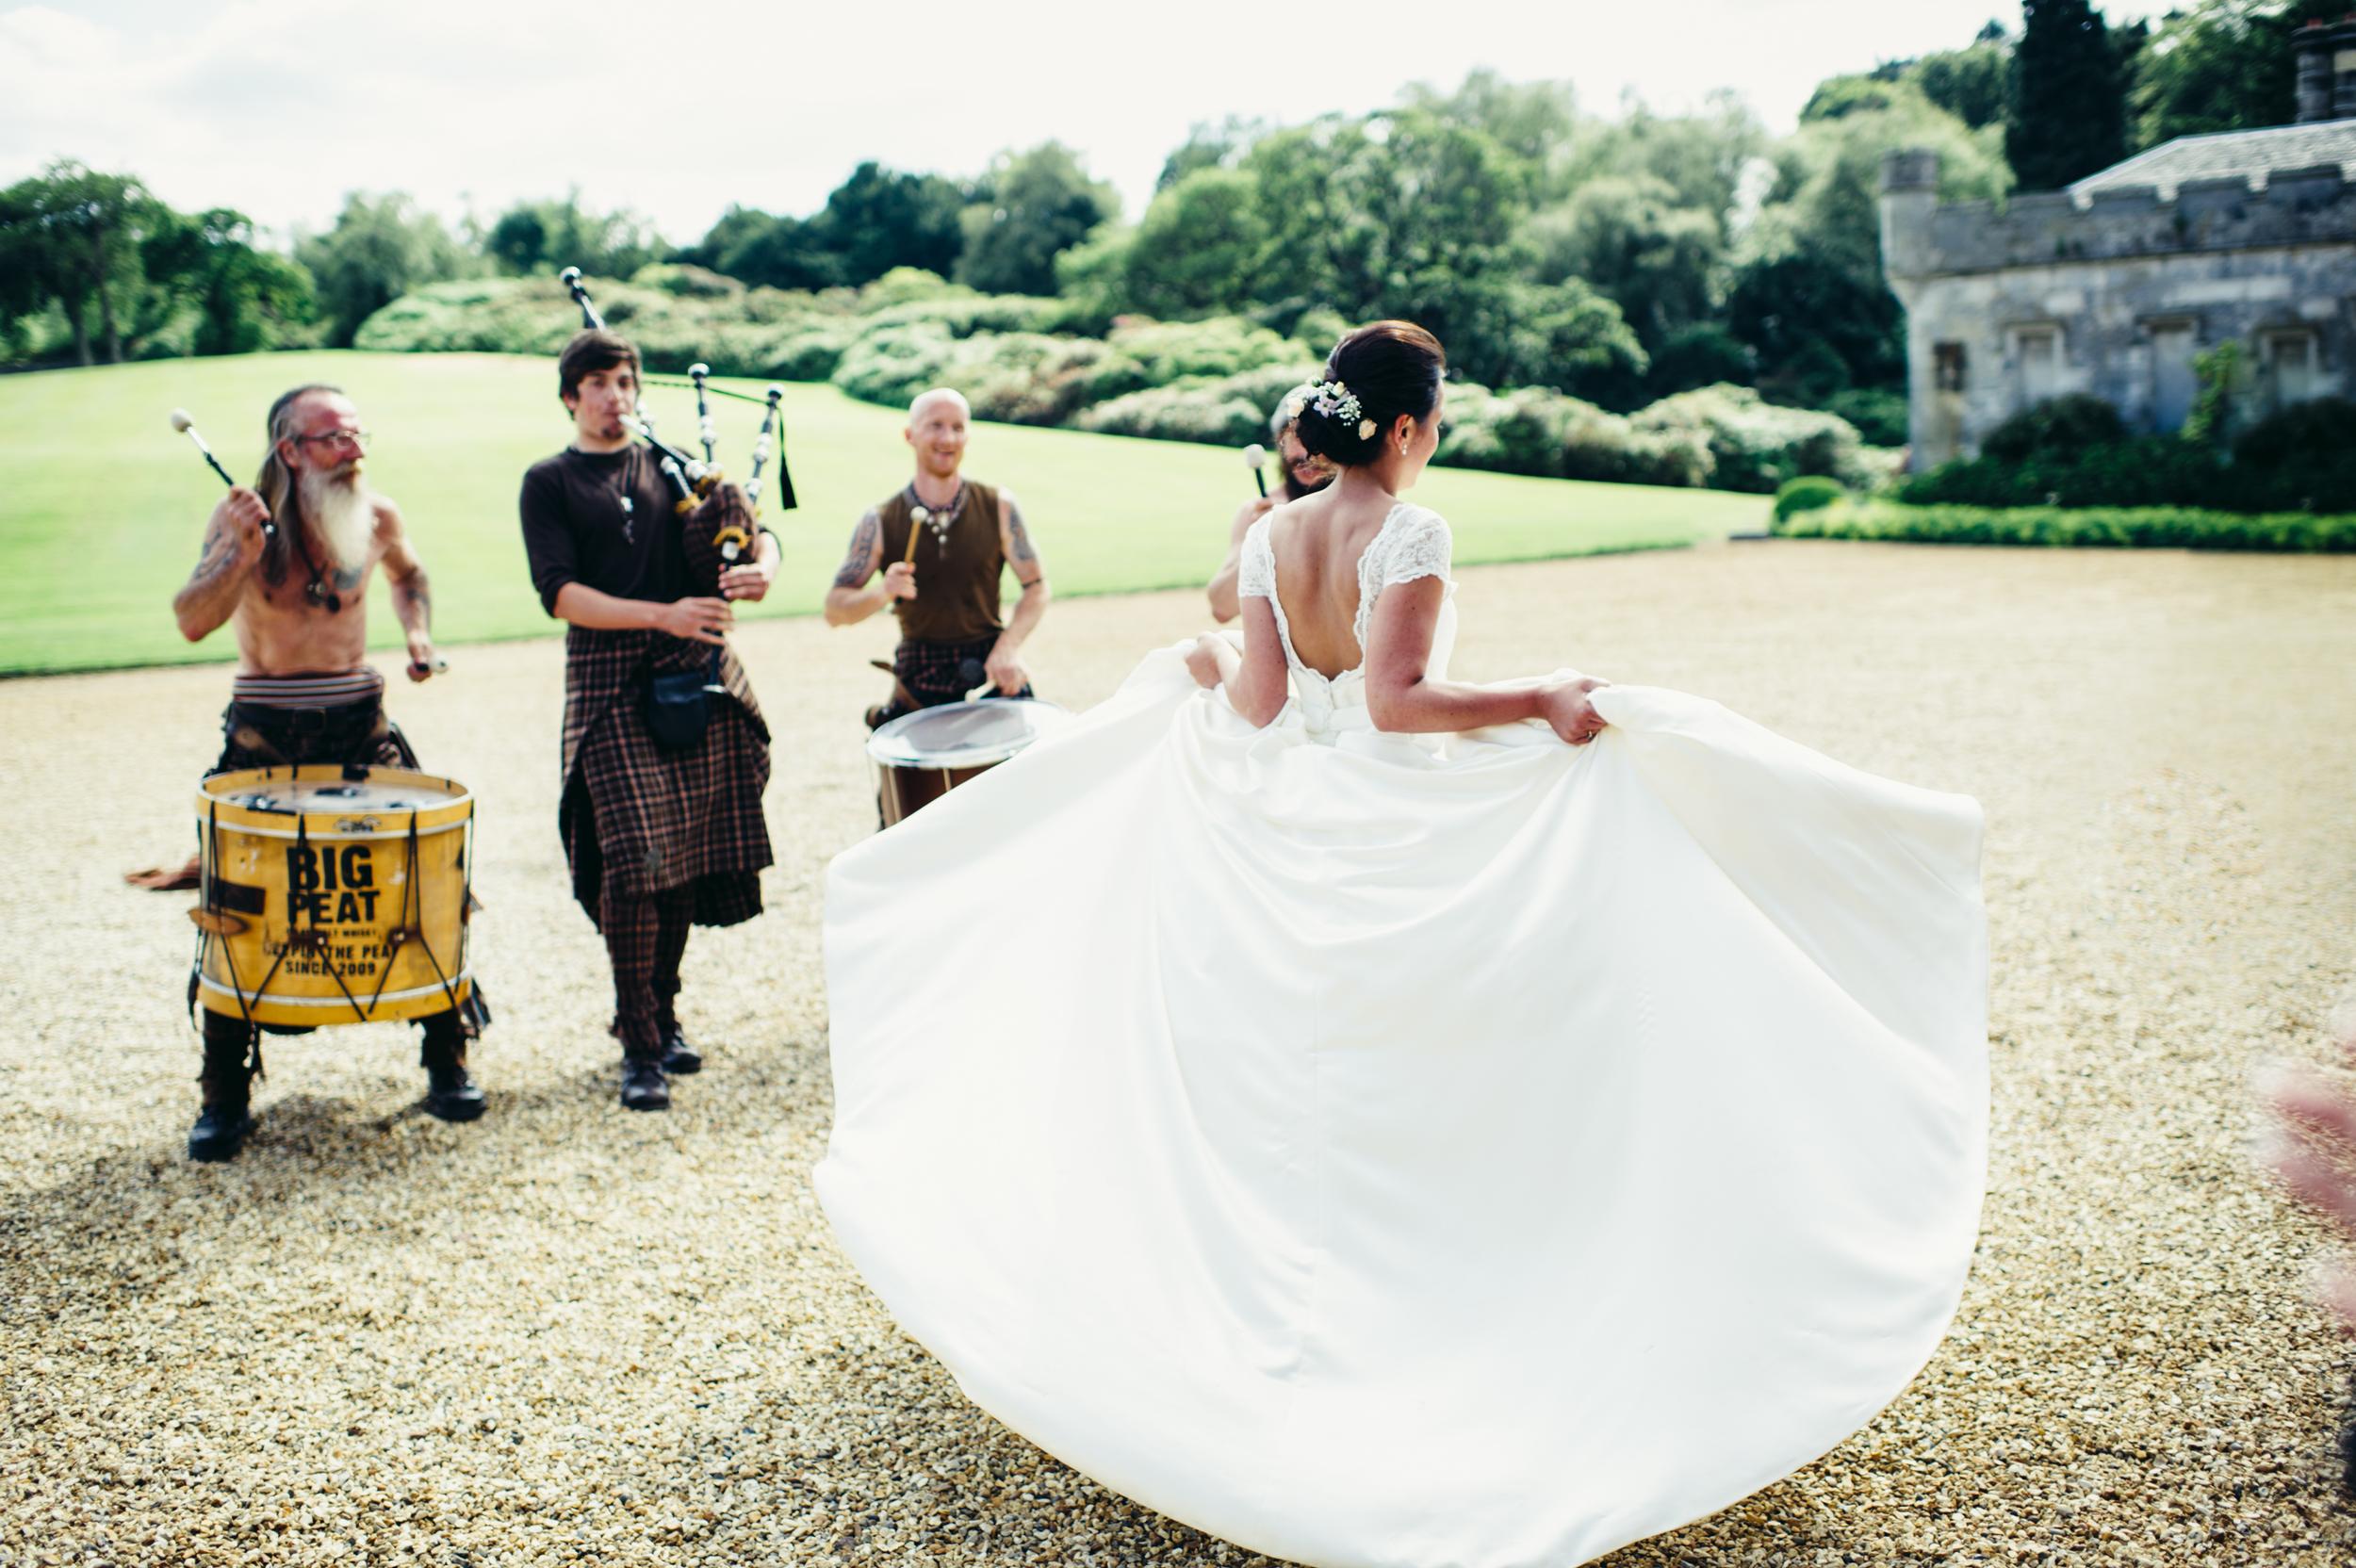 0149-lisa-devine-alternative-creative-wedding-photography-glasgow-edinburgh.JPG